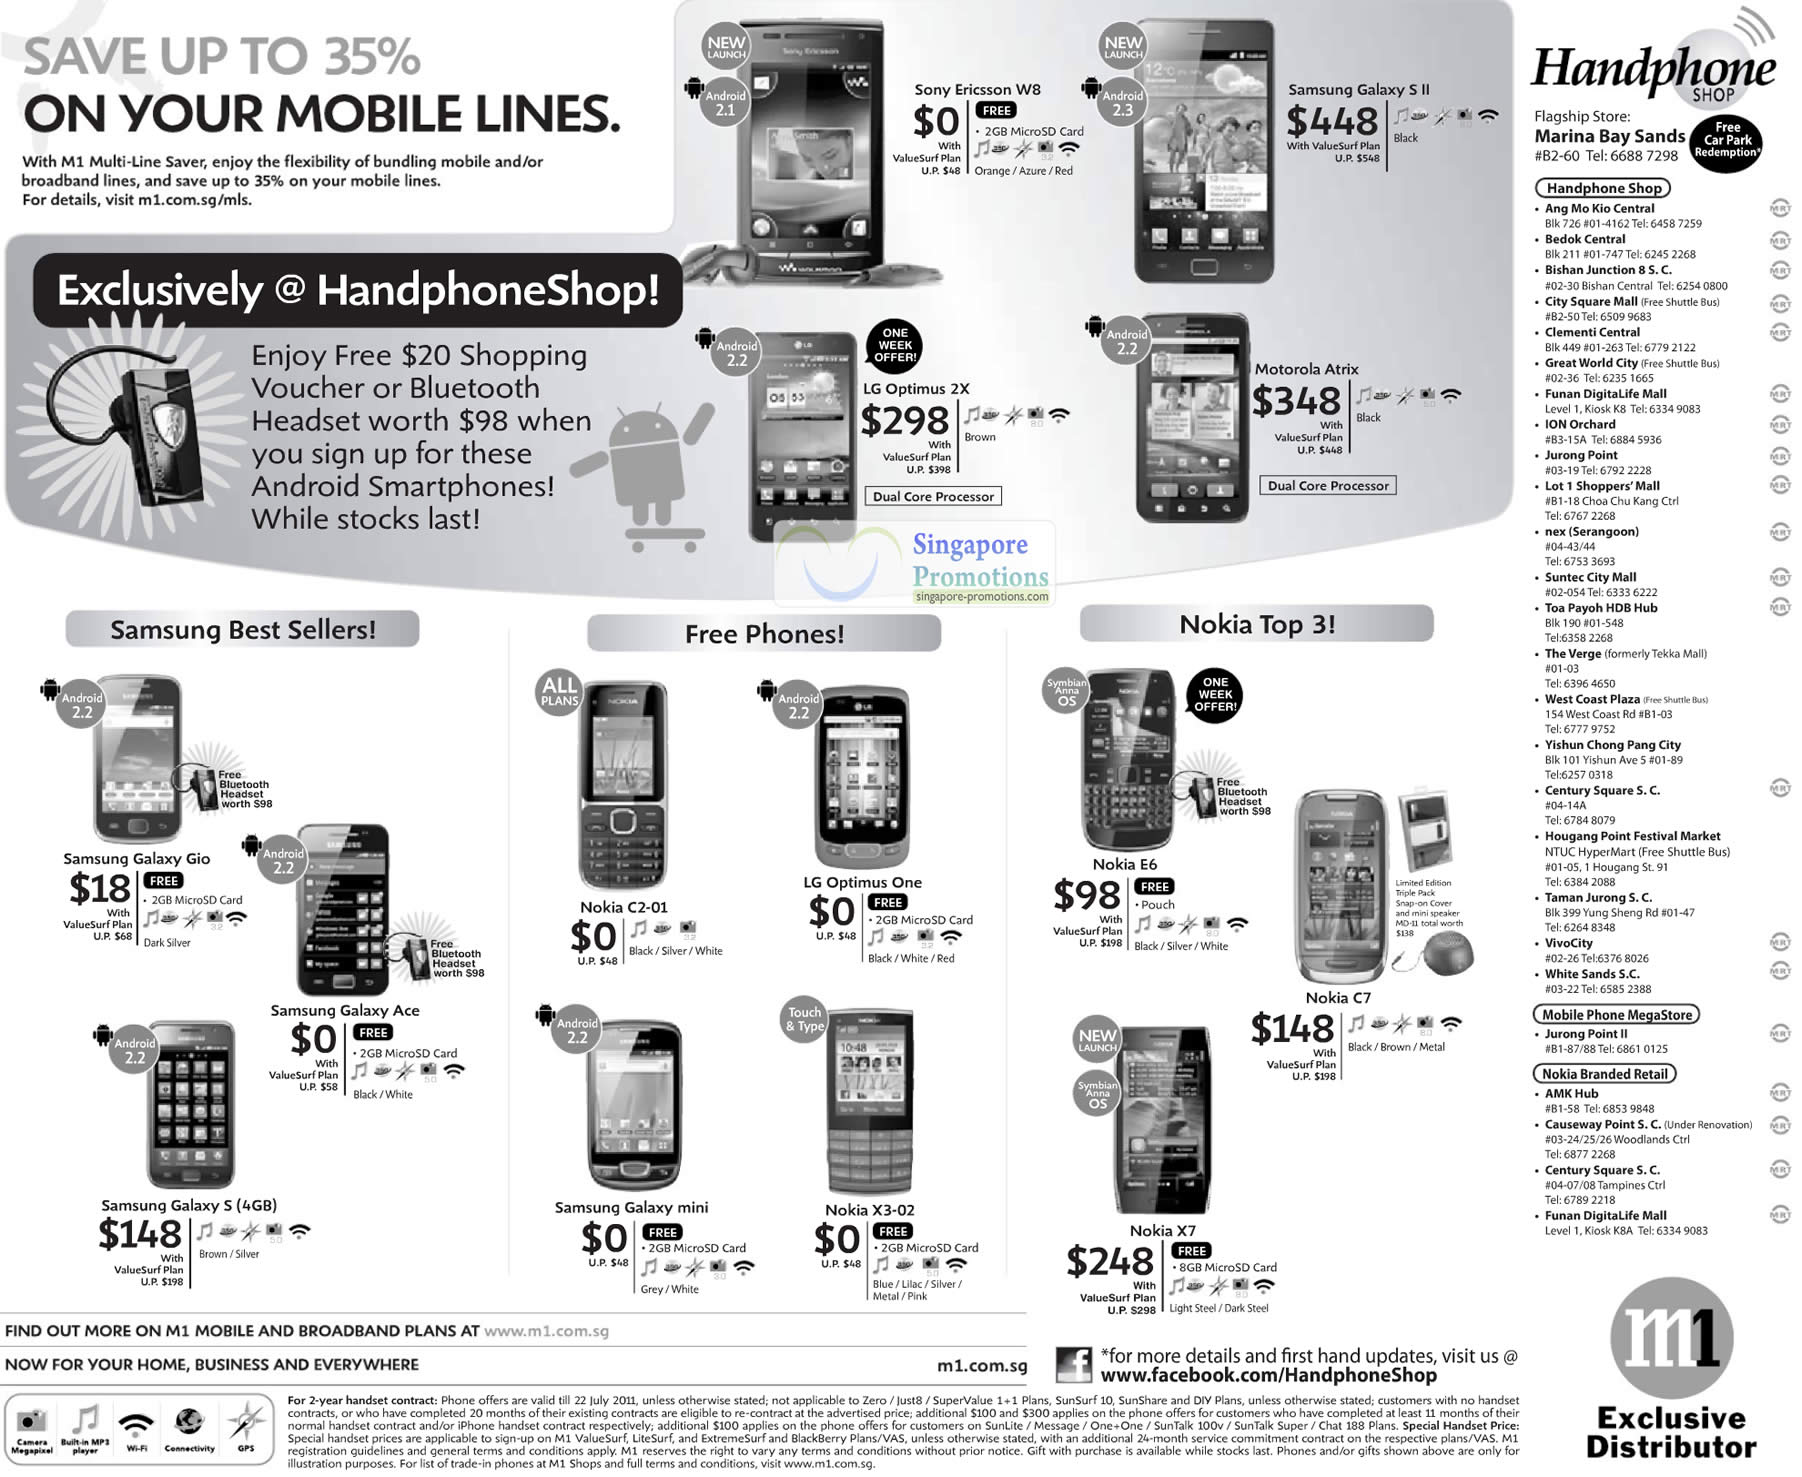 Handphone Shop, Sony Ericsson W8, Samsung Galaxy S II, LG Optimus 2X, Motorola Atrix, Galaxy Gio, Galaxy Ace, Galaxy S, Nokia X3-02, C2-01, X7, C7, E6, LG Optimus One, Galaxy Mini